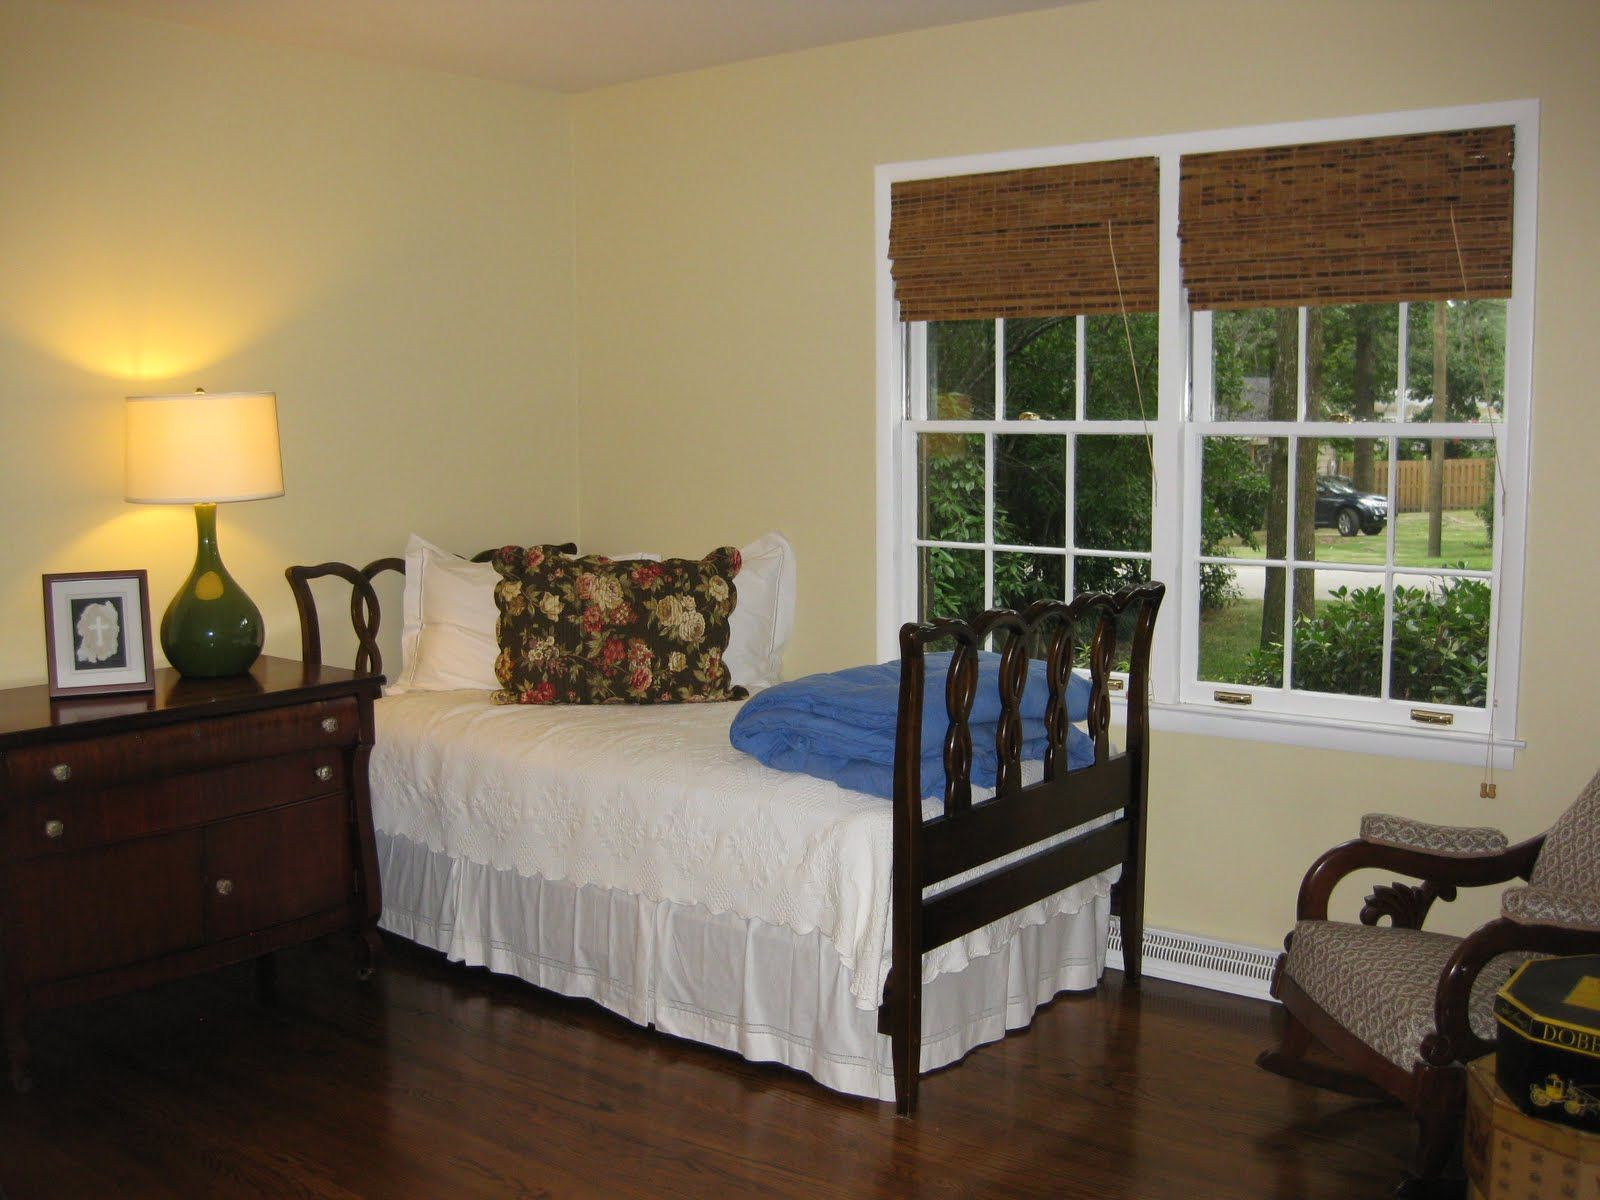 benjamin moore philadelphia cream paint philadelphia wall colors room colors. Black Bedroom Furniture Sets. Home Design Ideas